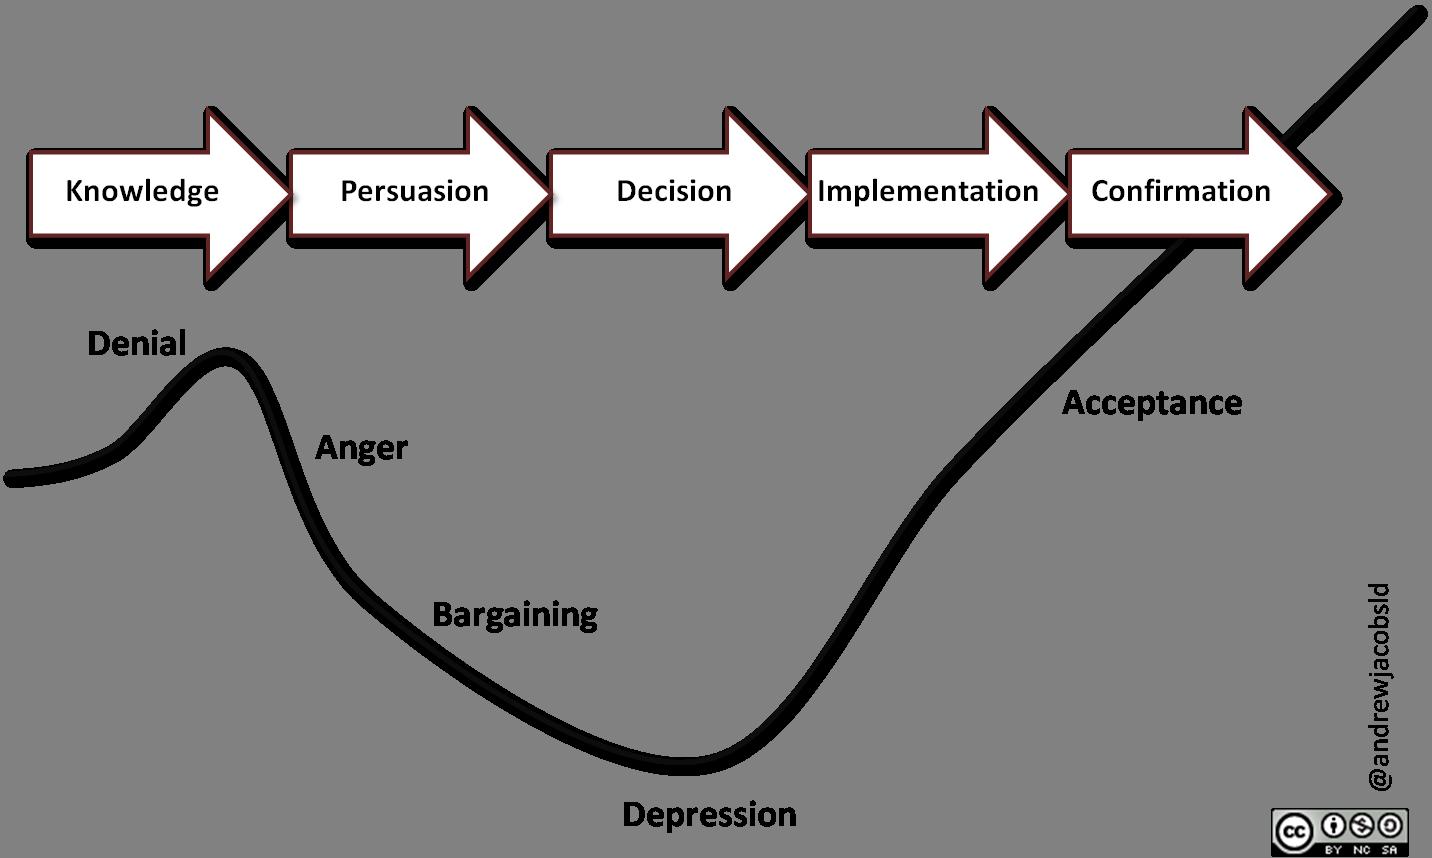 Kubler-Ross Five Stage Model